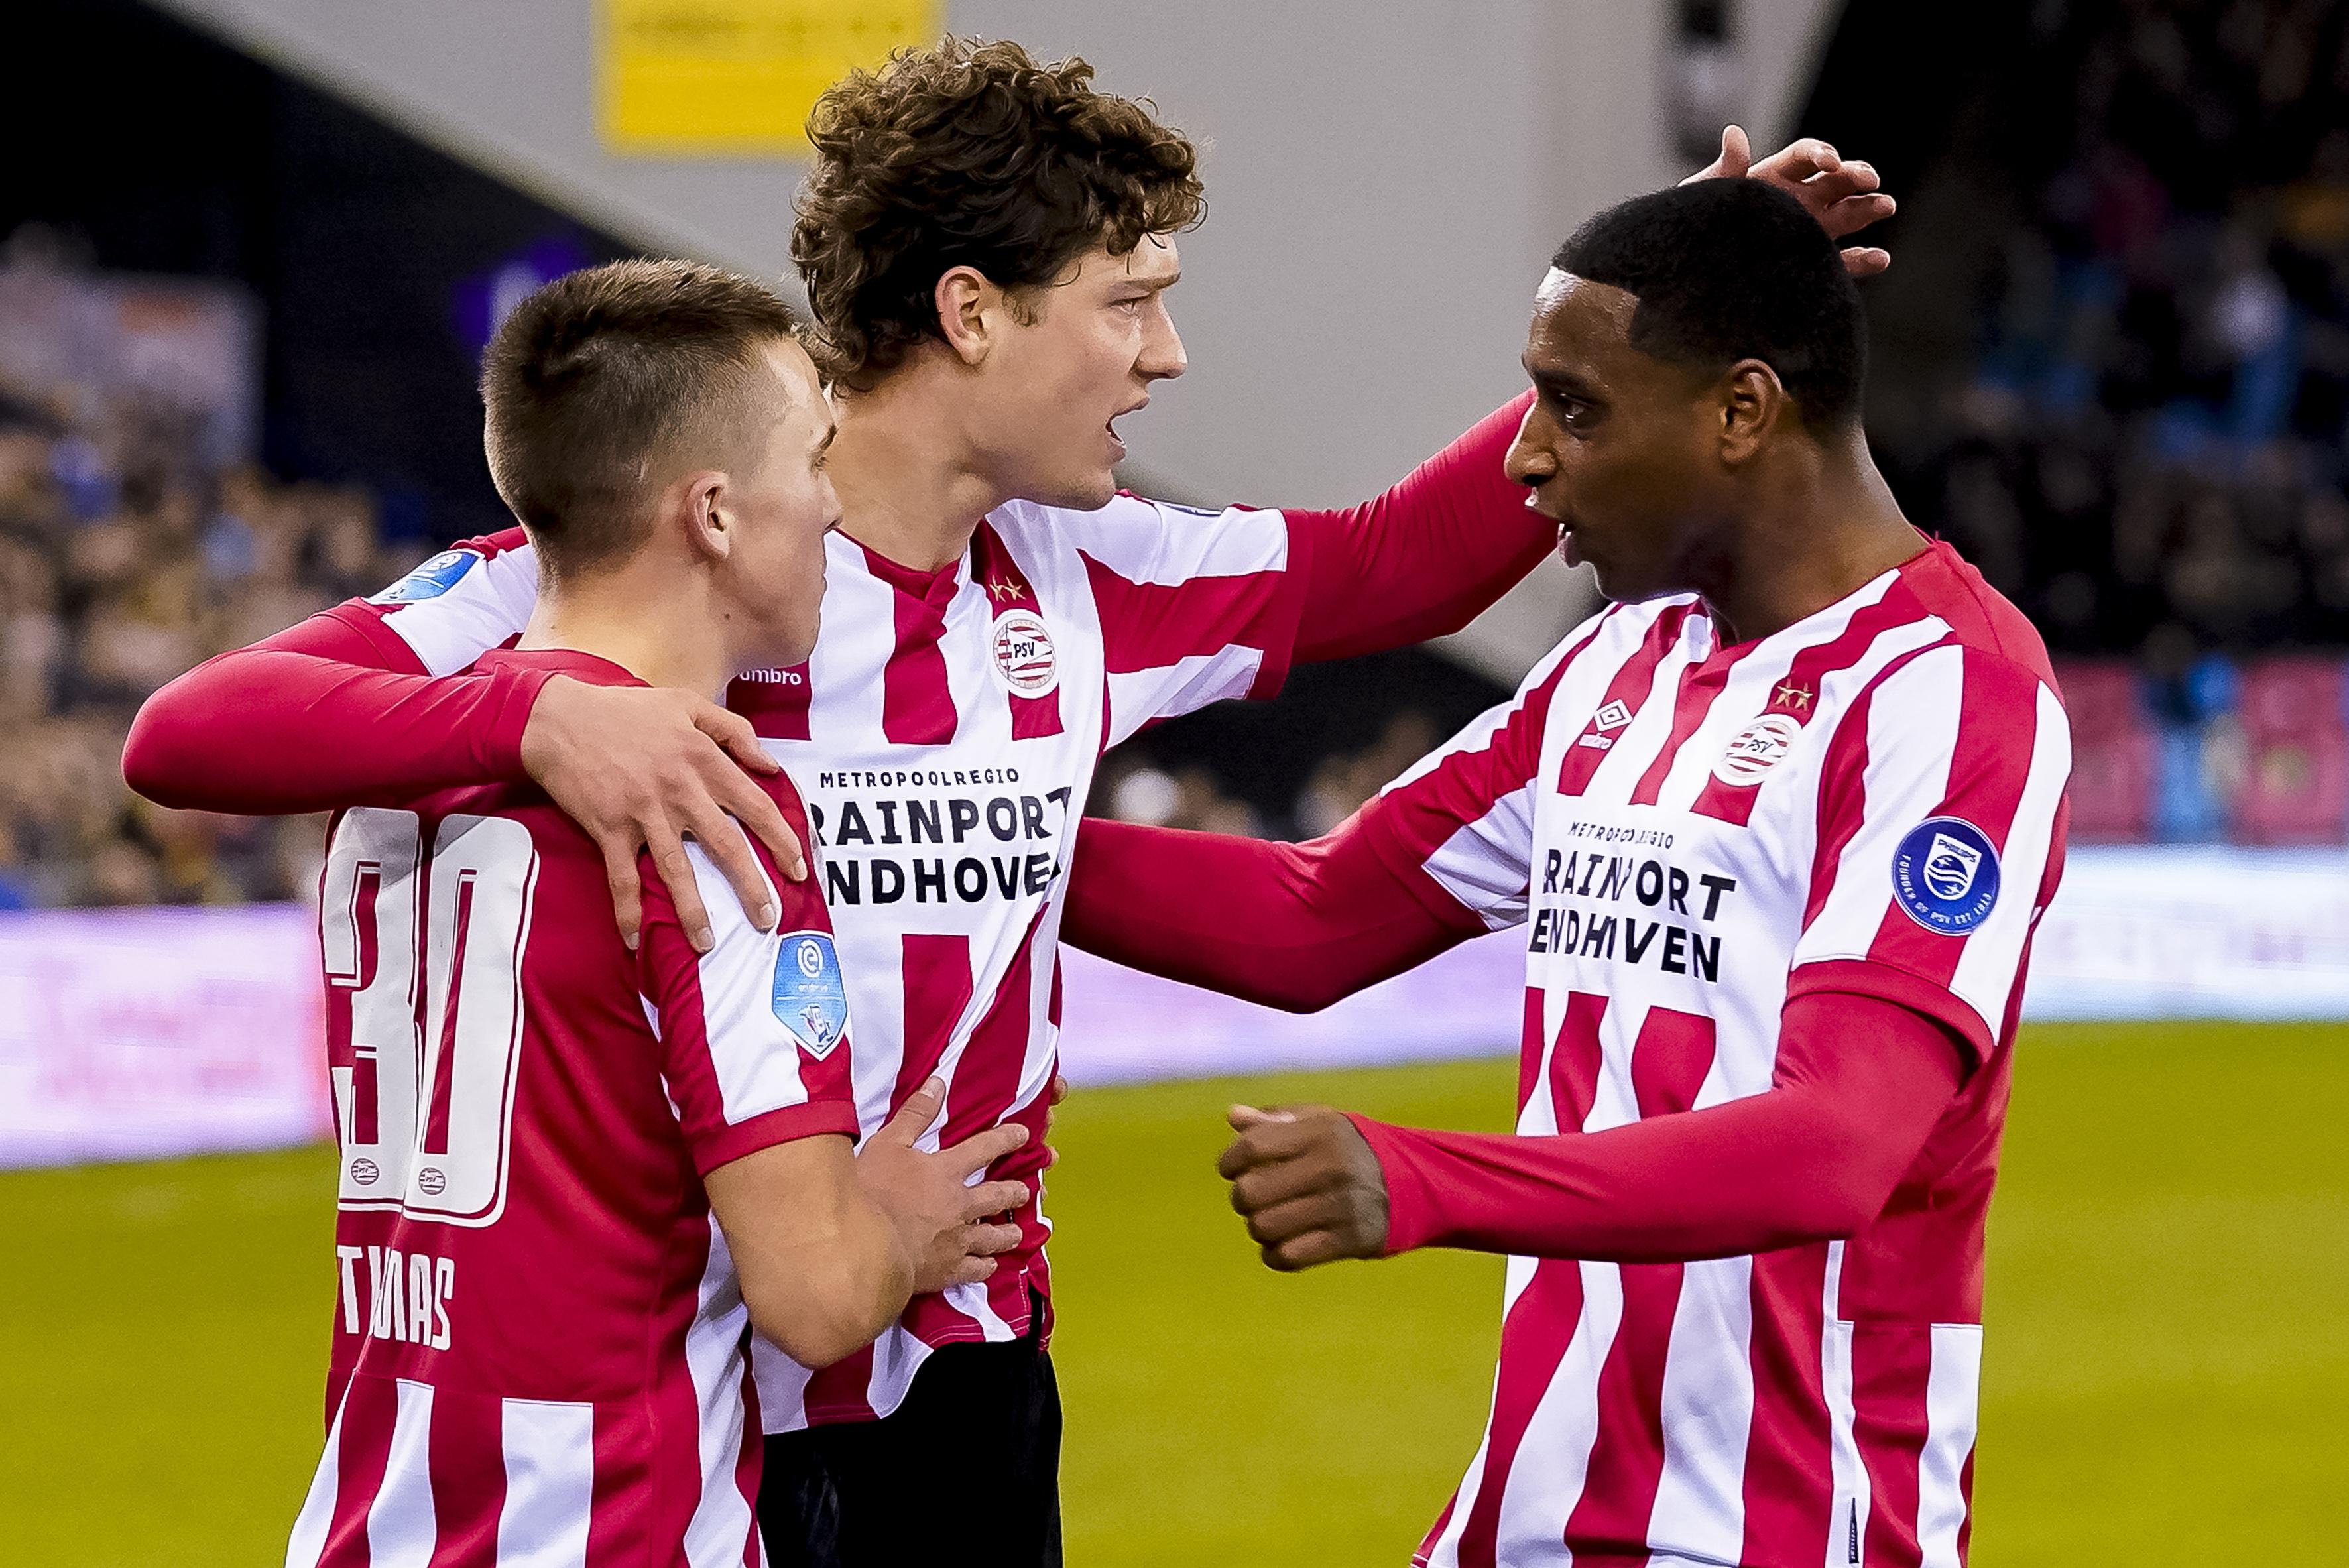 ONLY GOAL NETHERLANDS - PSV Sam Lammers